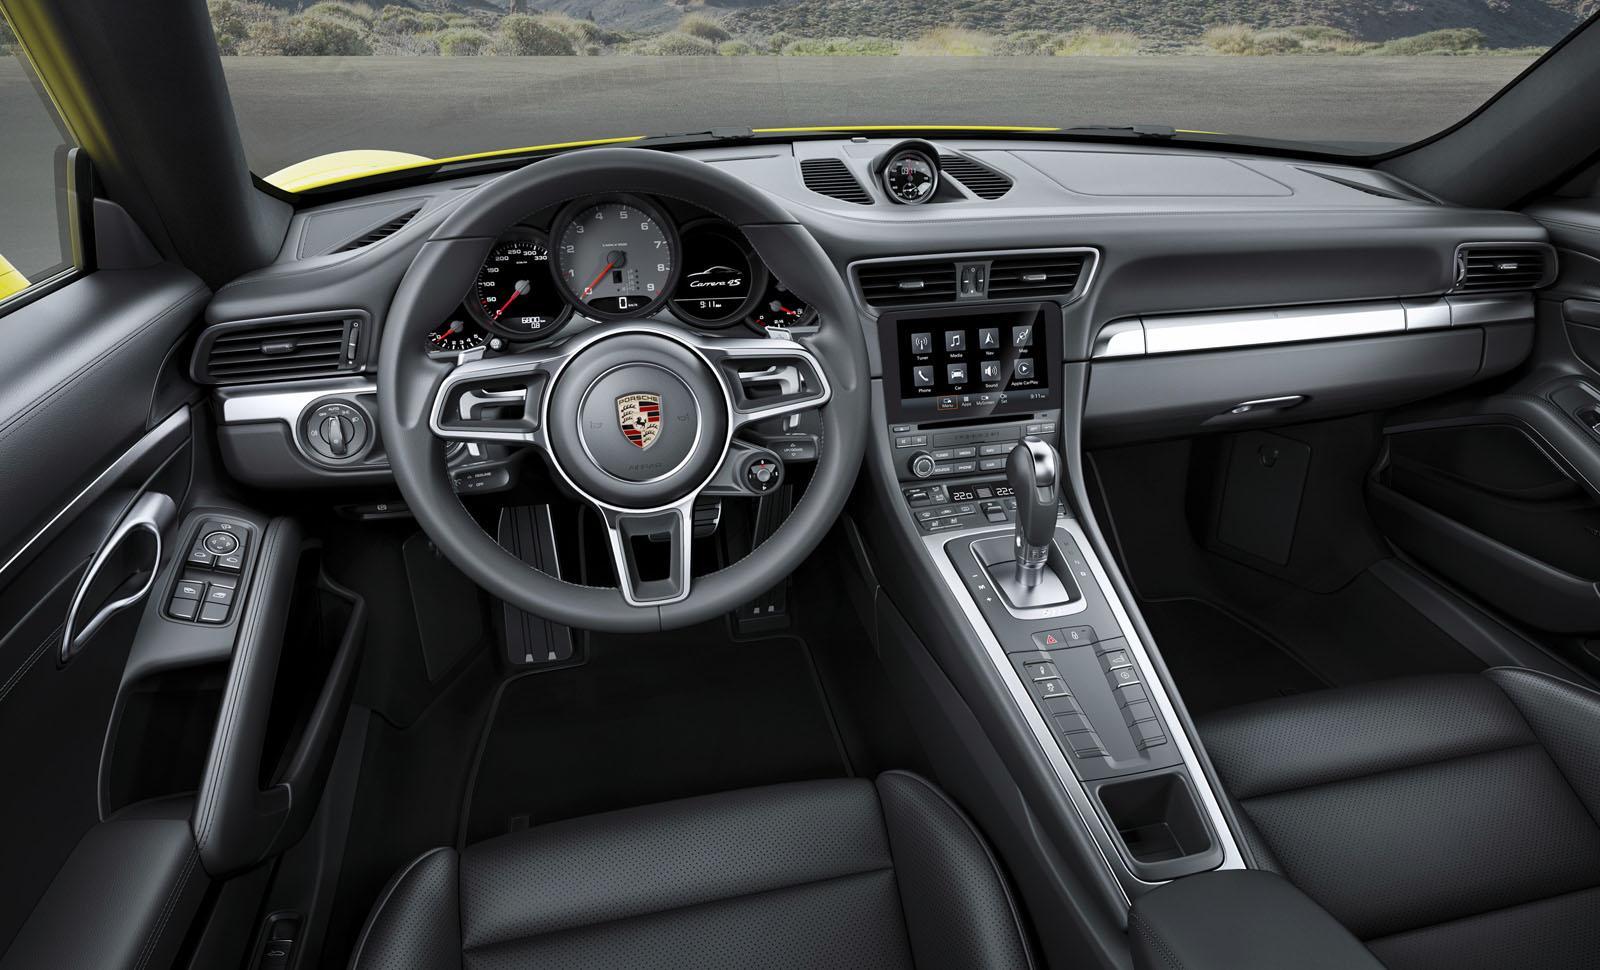 2014 Porsche Carrera 4s Cabriolet additionally 1996 Porsche 911 Turbo 7 in addition Time Attack likewise Jaguar further 59859959. on 2015 porsche 911 awd